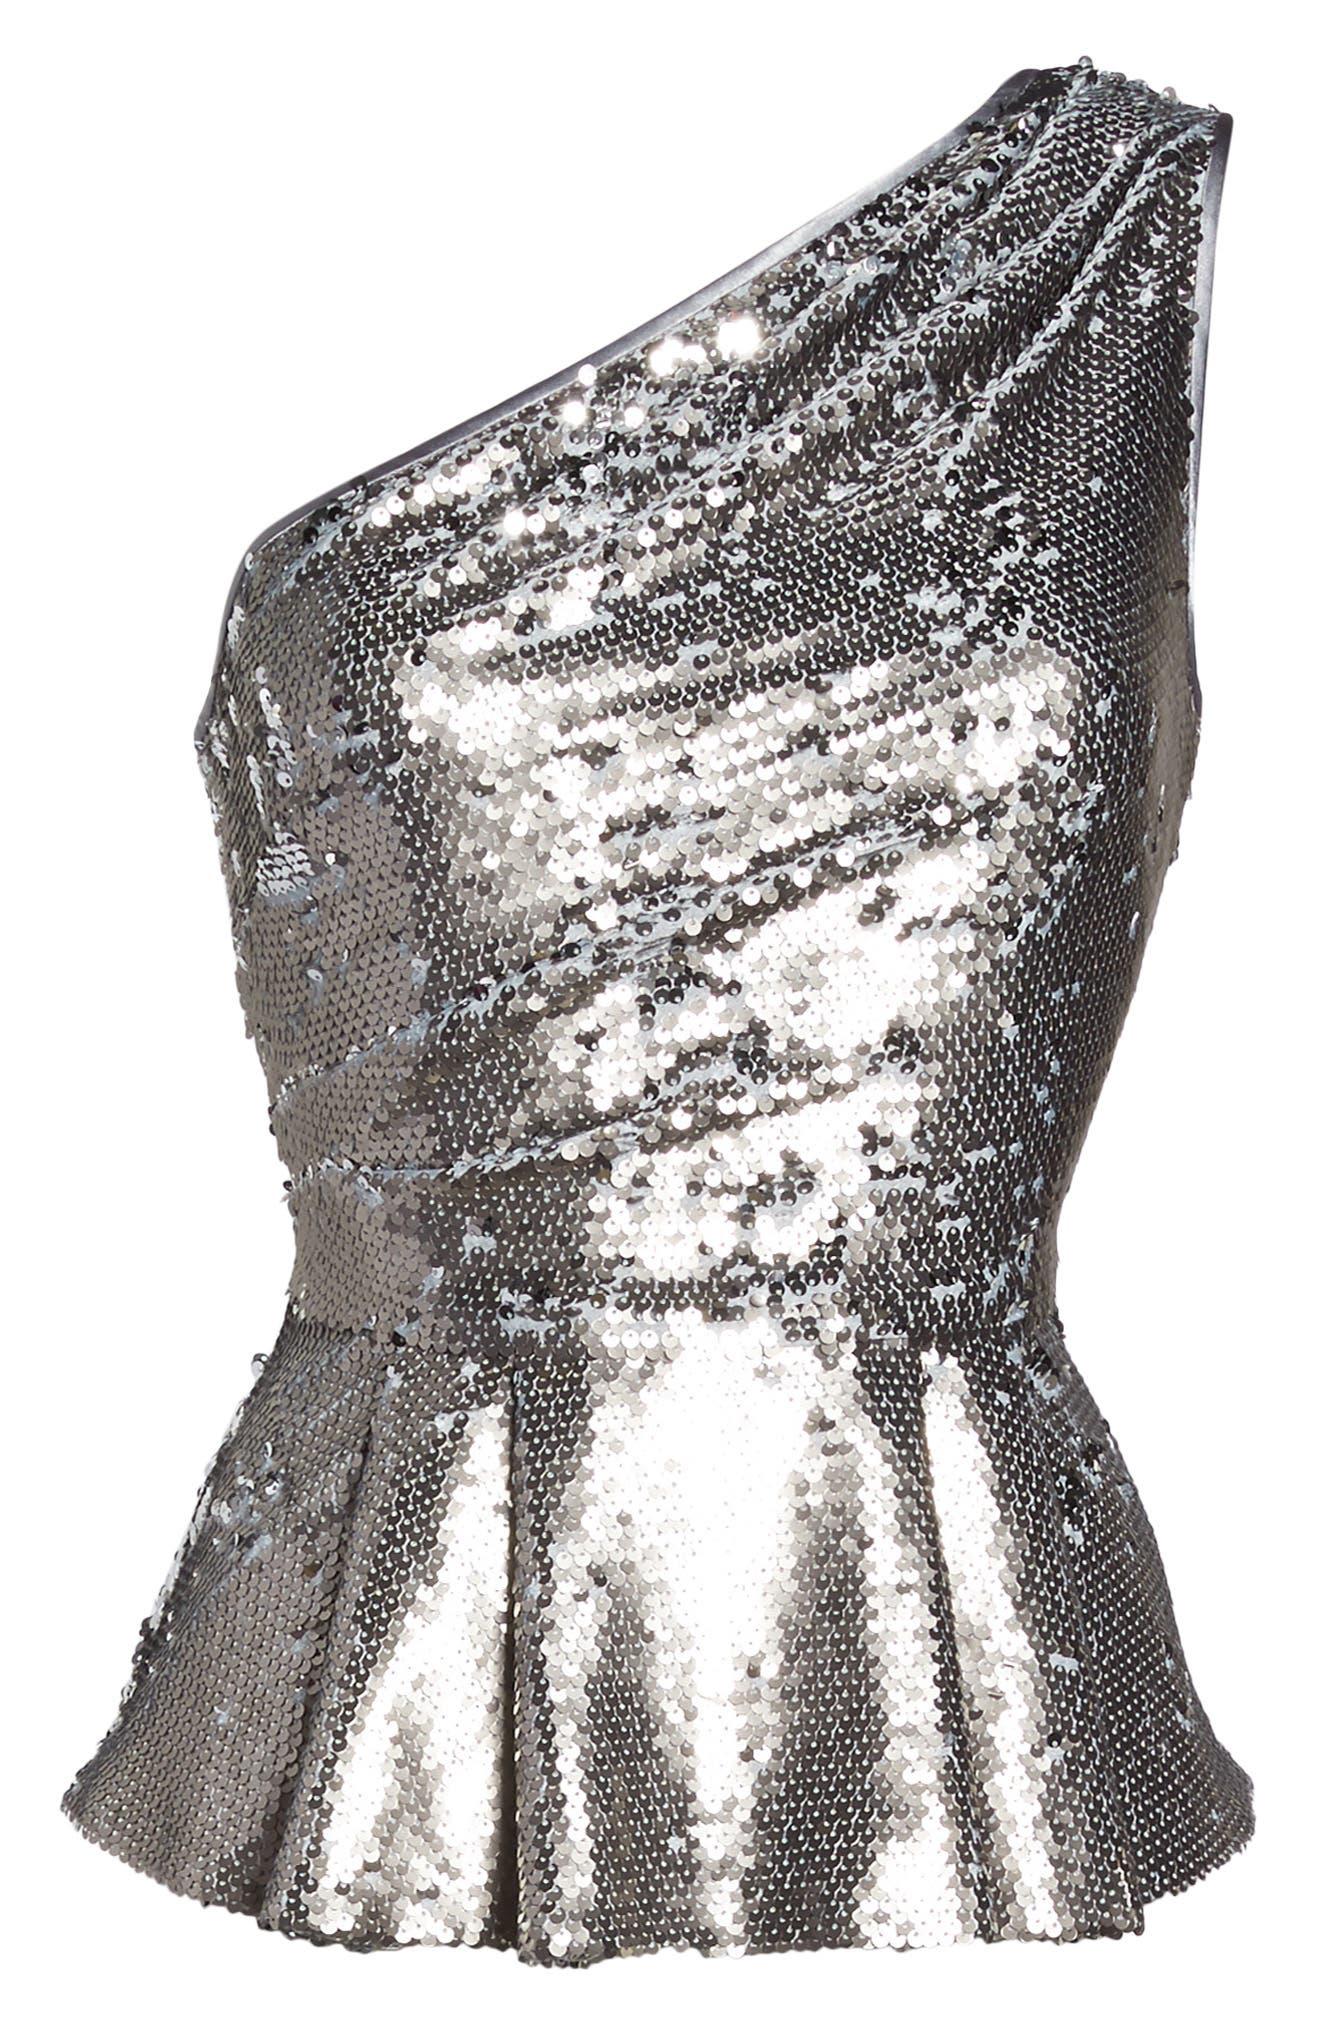 One-Shoulder Sequin Peplum Top,                             Alternate thumbnail 6, color,                             040